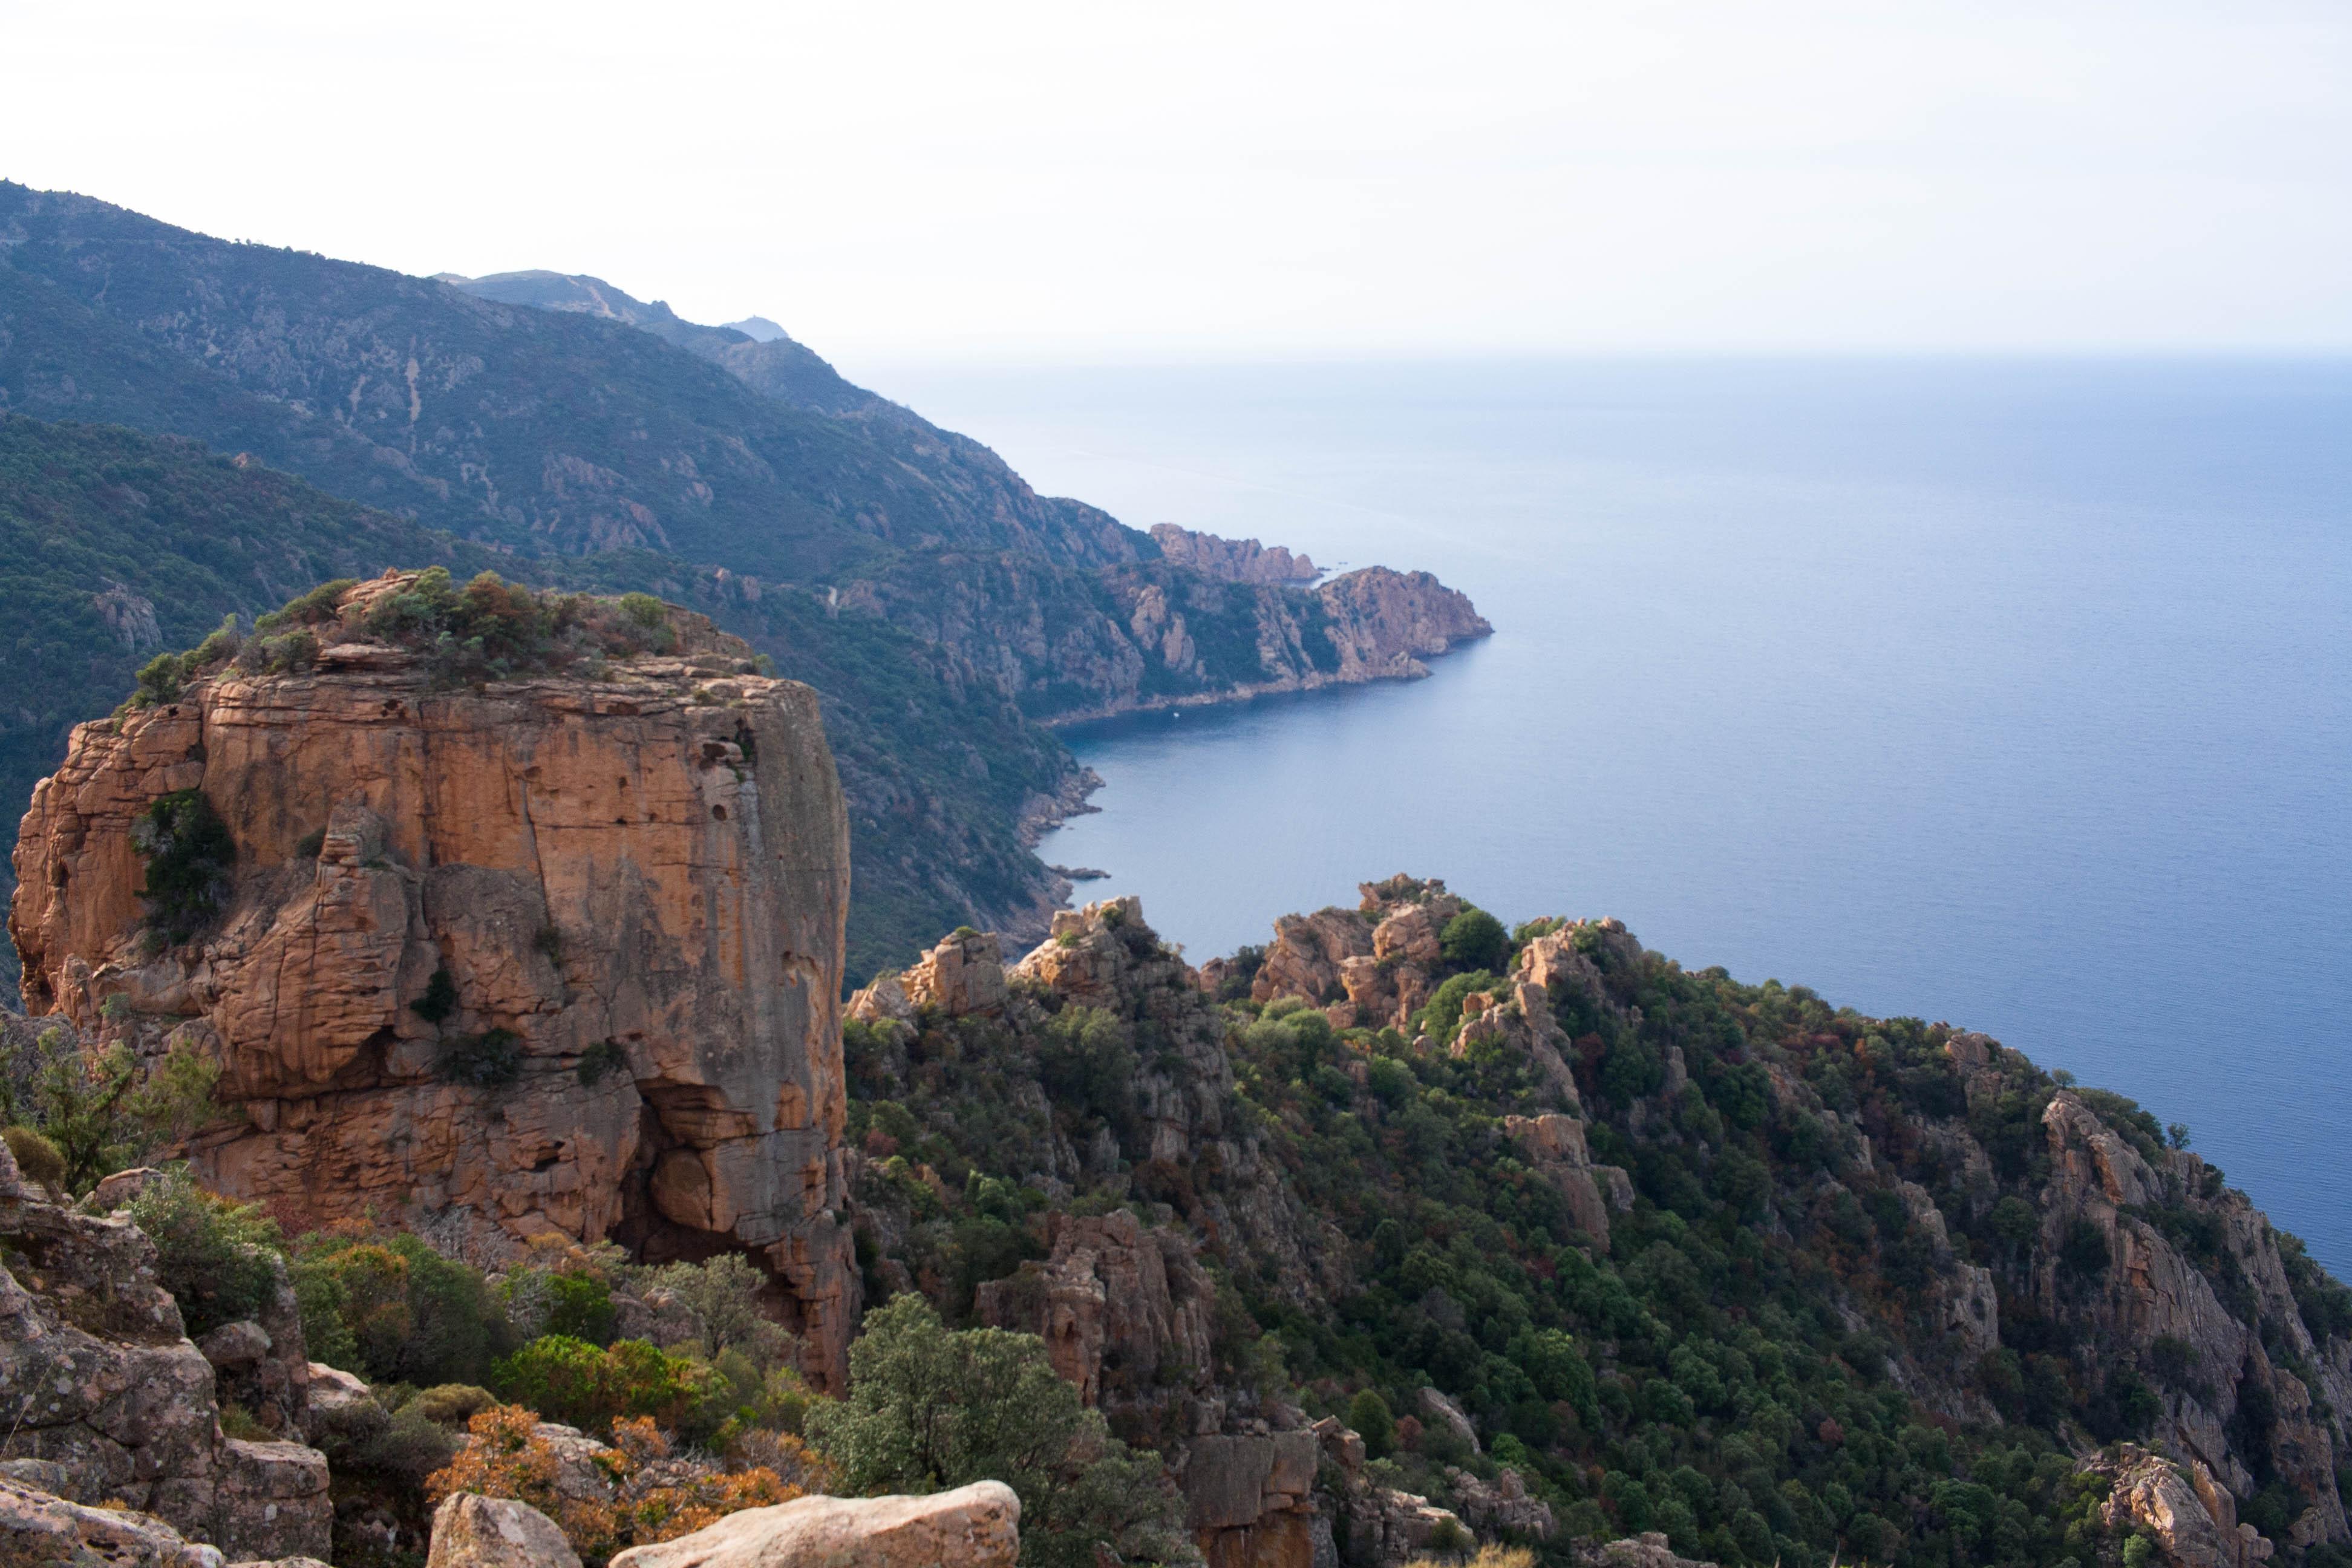 Roadtrip en Corse